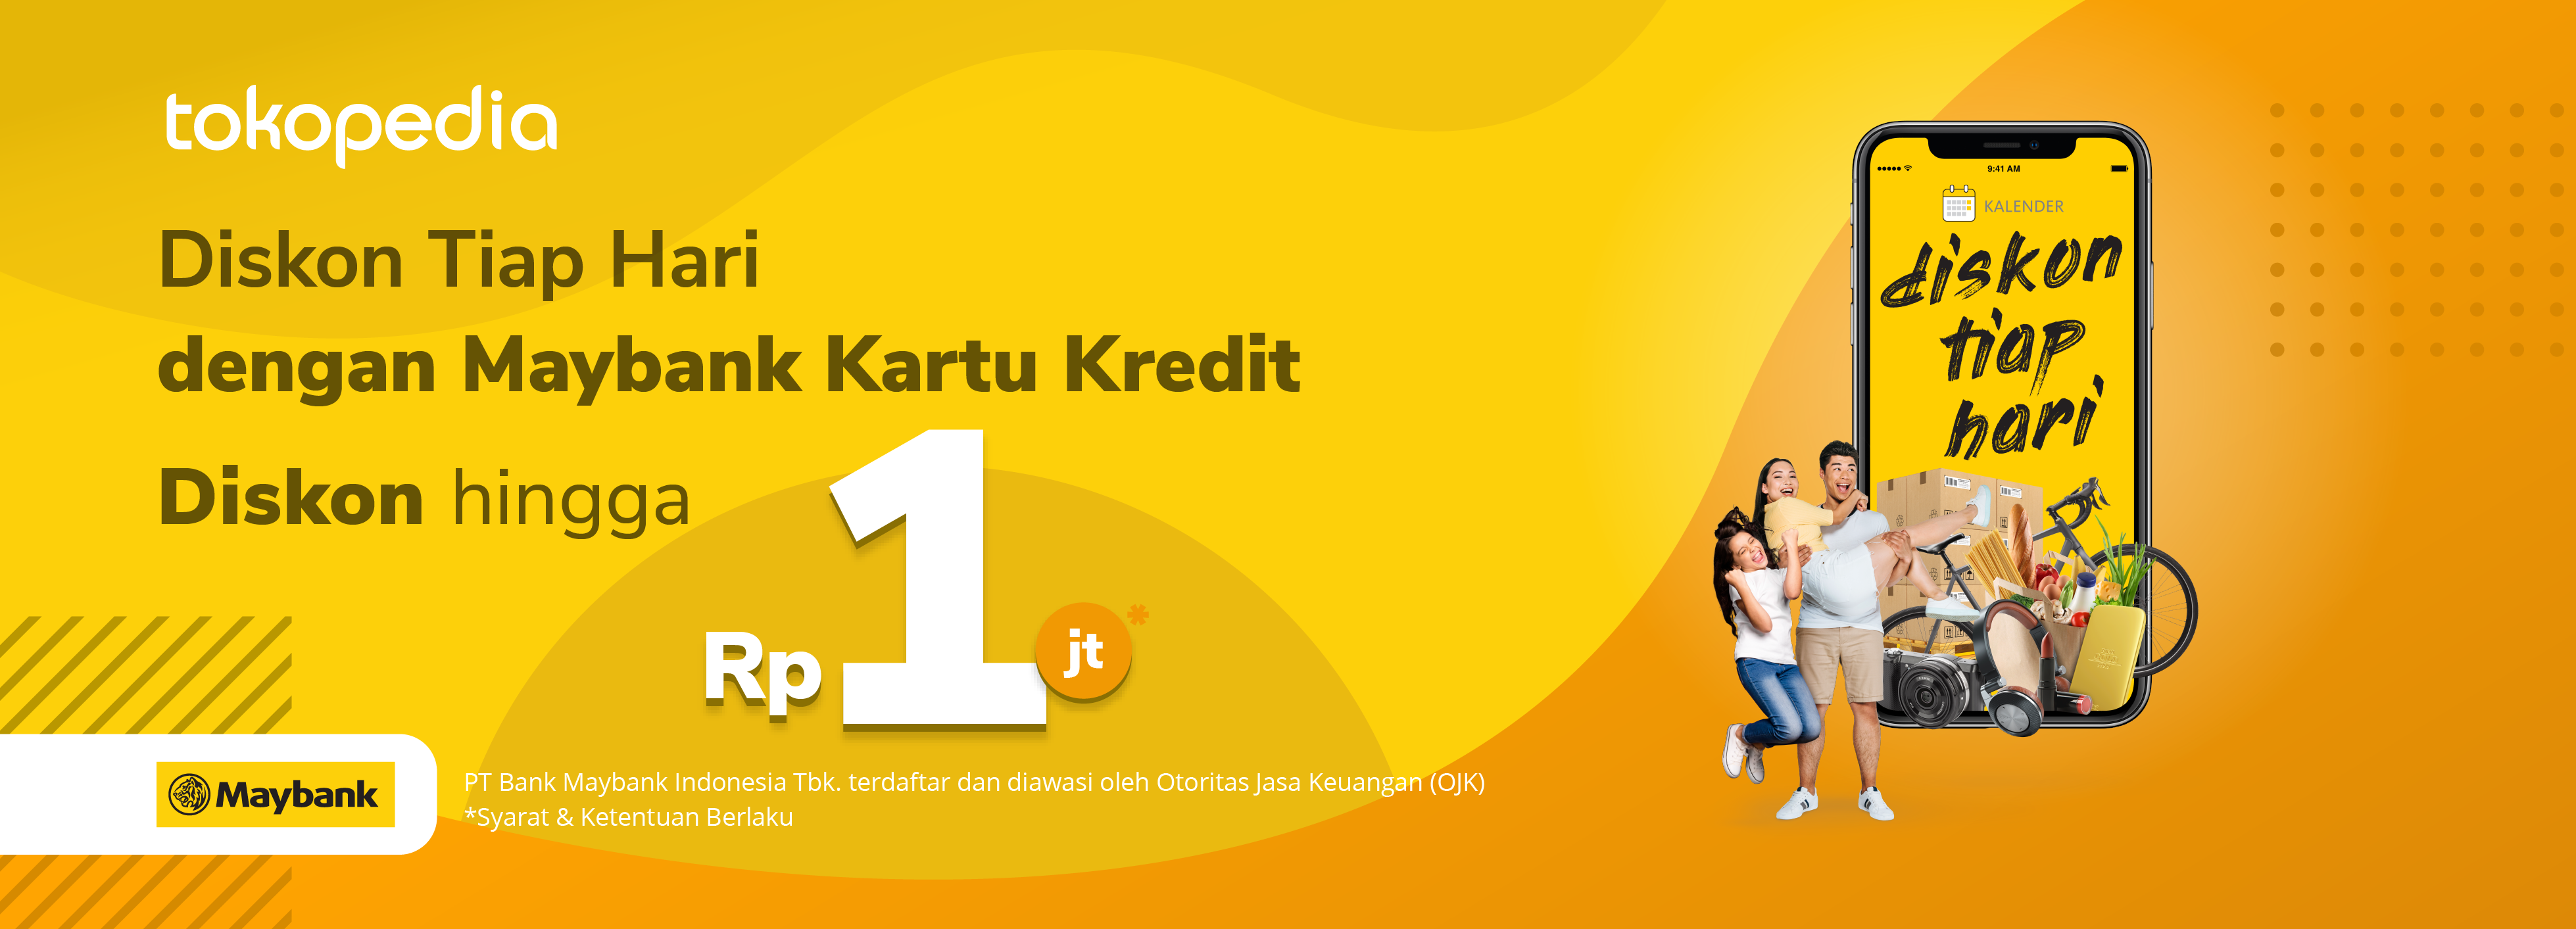 Belanja Hemat Dapat Promo Hebat dengan Maybank Kartu Kredit!